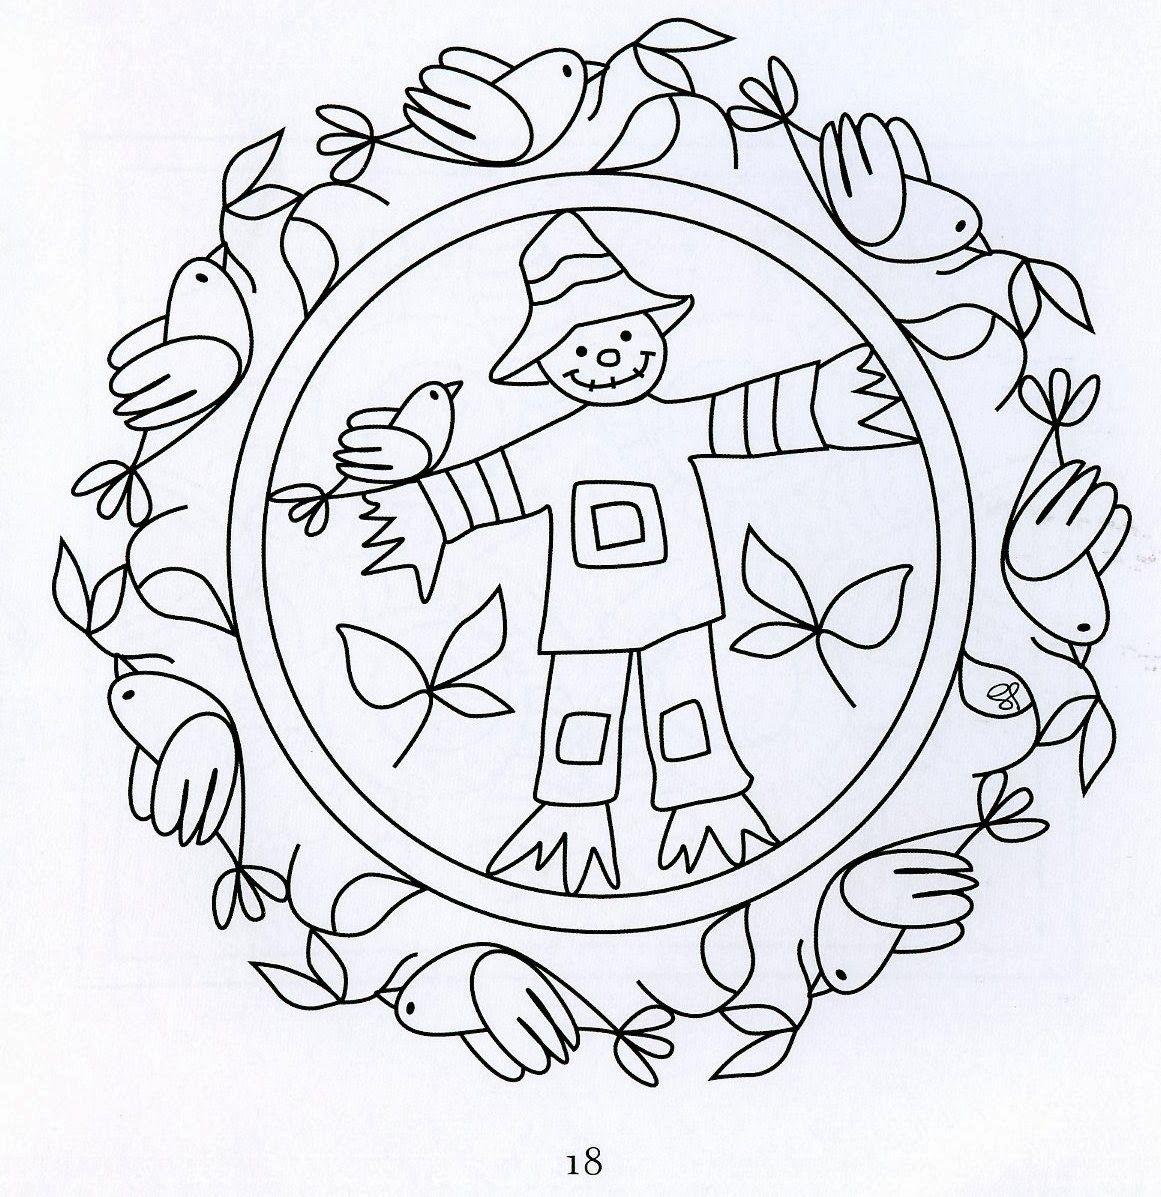 Mikapanteleon